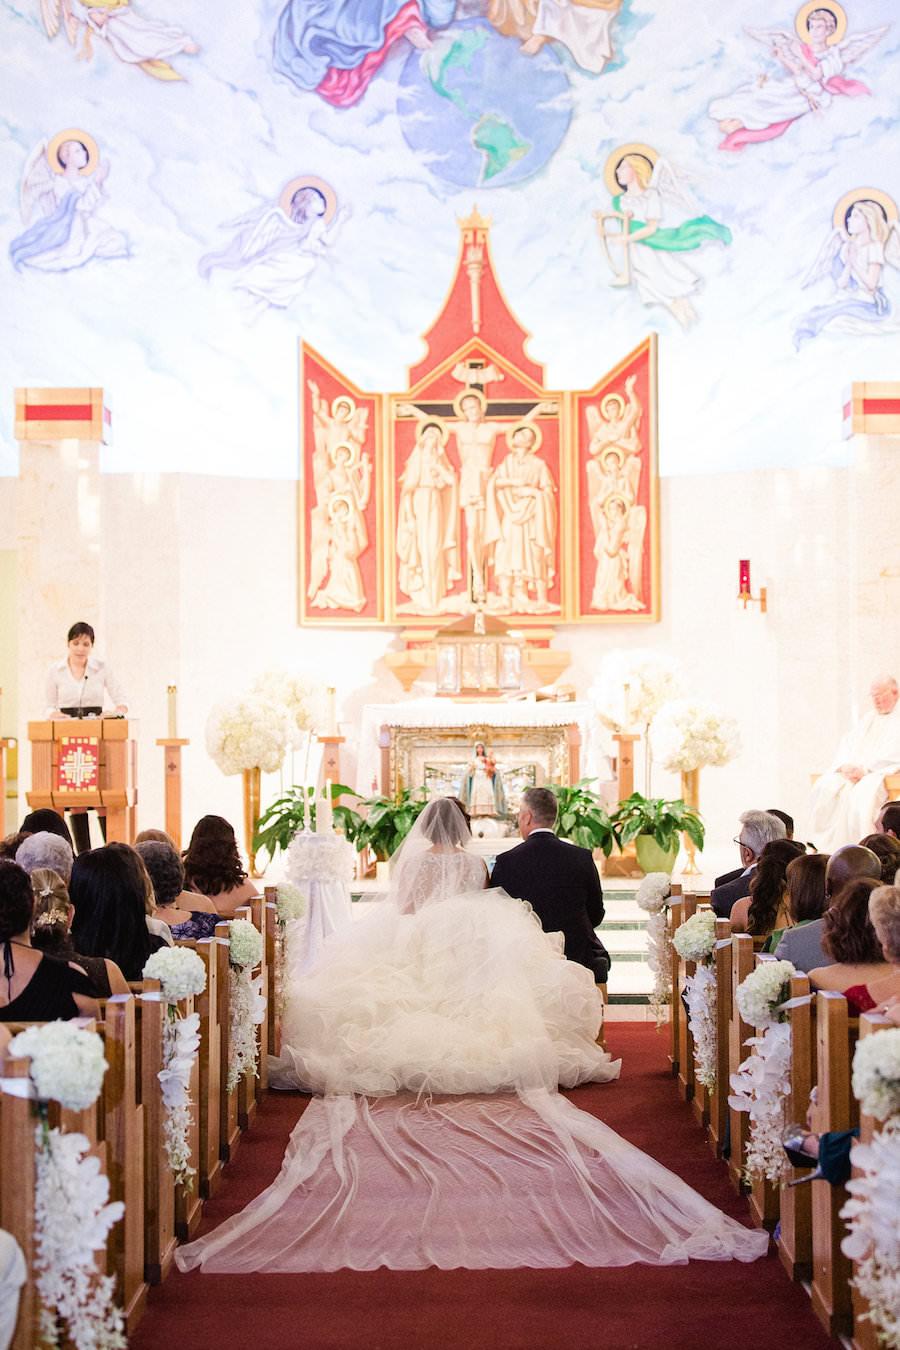 Liana Fuente Wedding Ceremony Portrait at St. Joseph's Catholic Church | Tampa Wedding Photographer Ailyn La Torre Photography